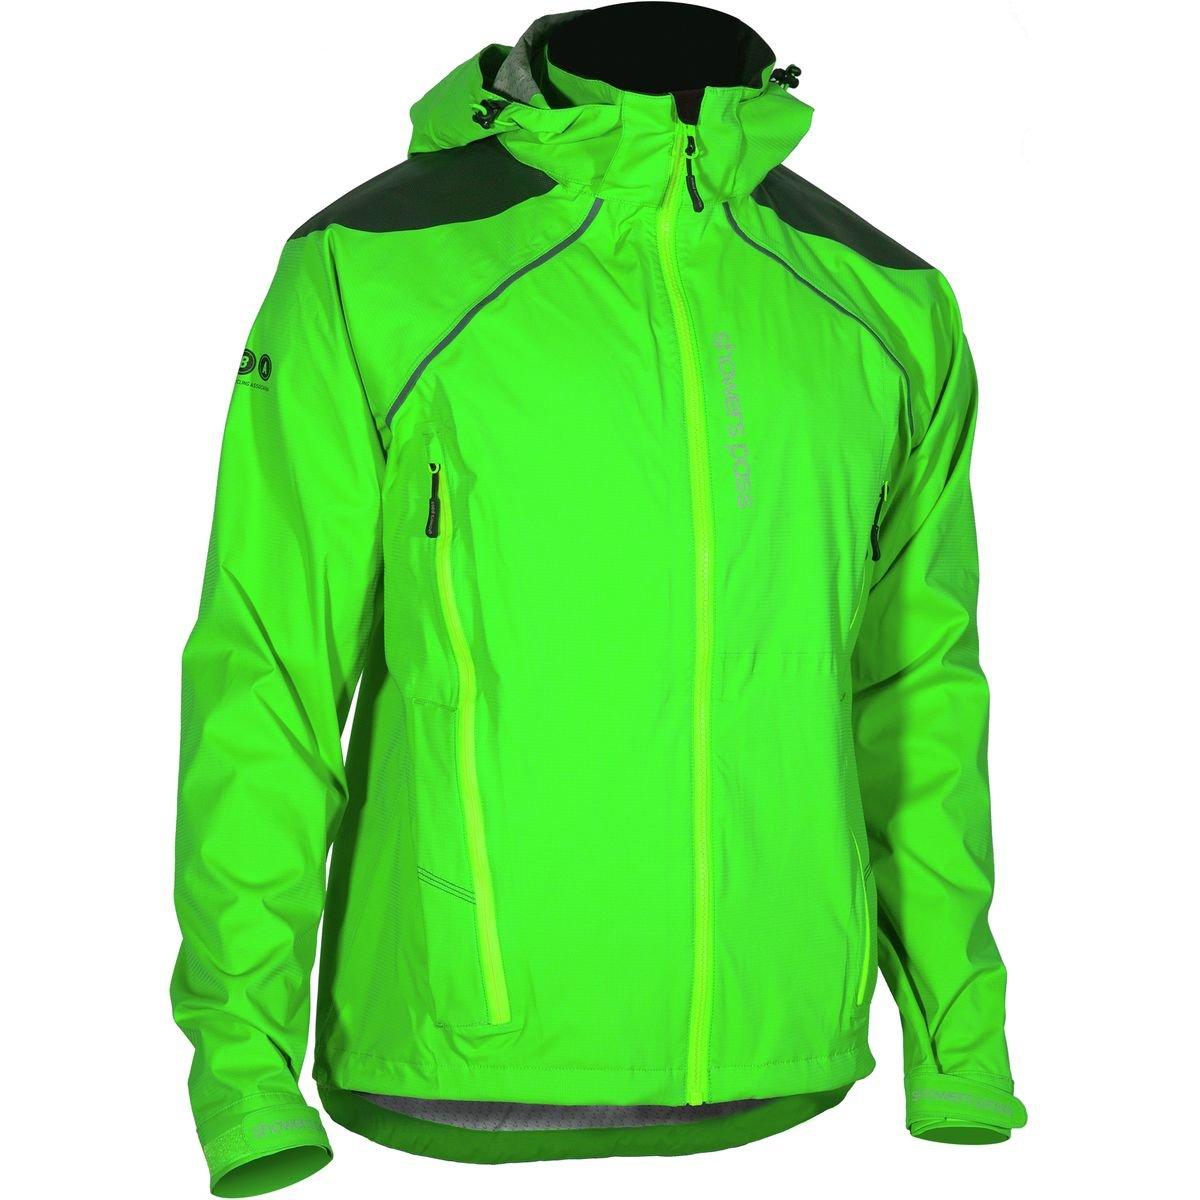 Showers Pass Imba Jacket – Men 's B0767HG53N X-Large|グリーン グリーン X-Large